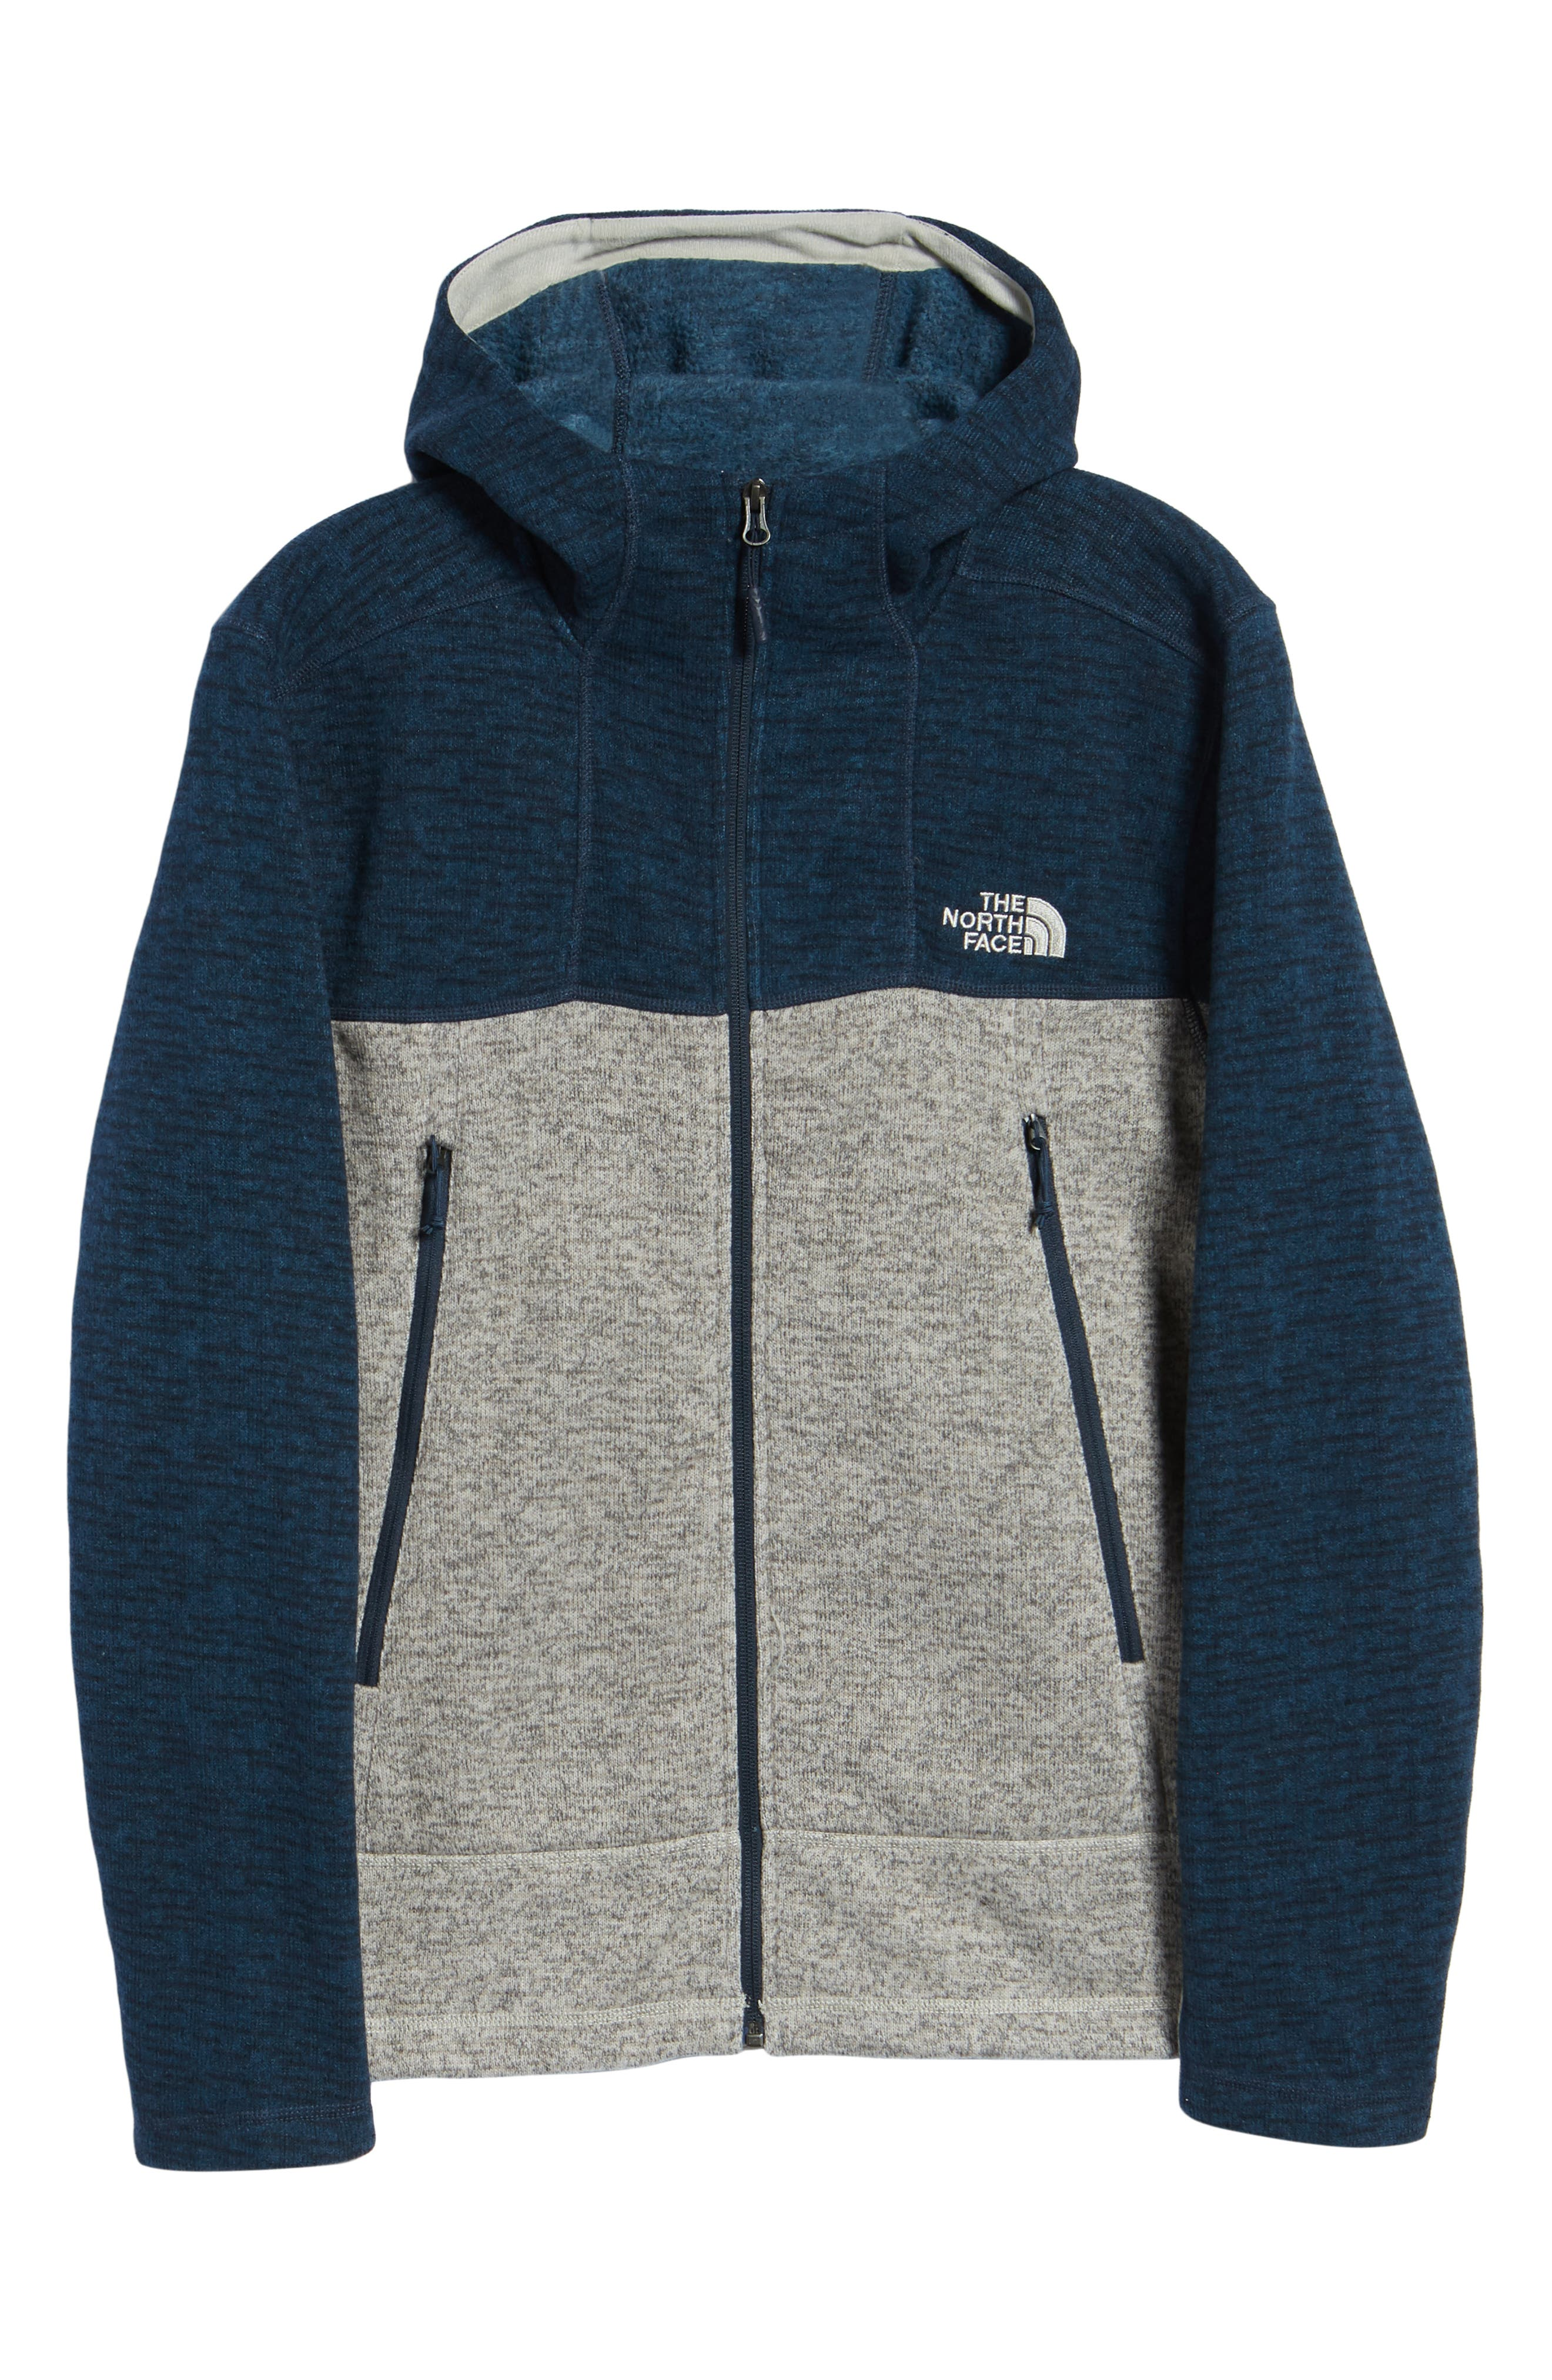 Gordon Lyons Alpine Sweater Fleece Hoodie,                             Alternate thumbnail 7, color,                             URBAN NAVY/ GRANITE BLUFF TAN